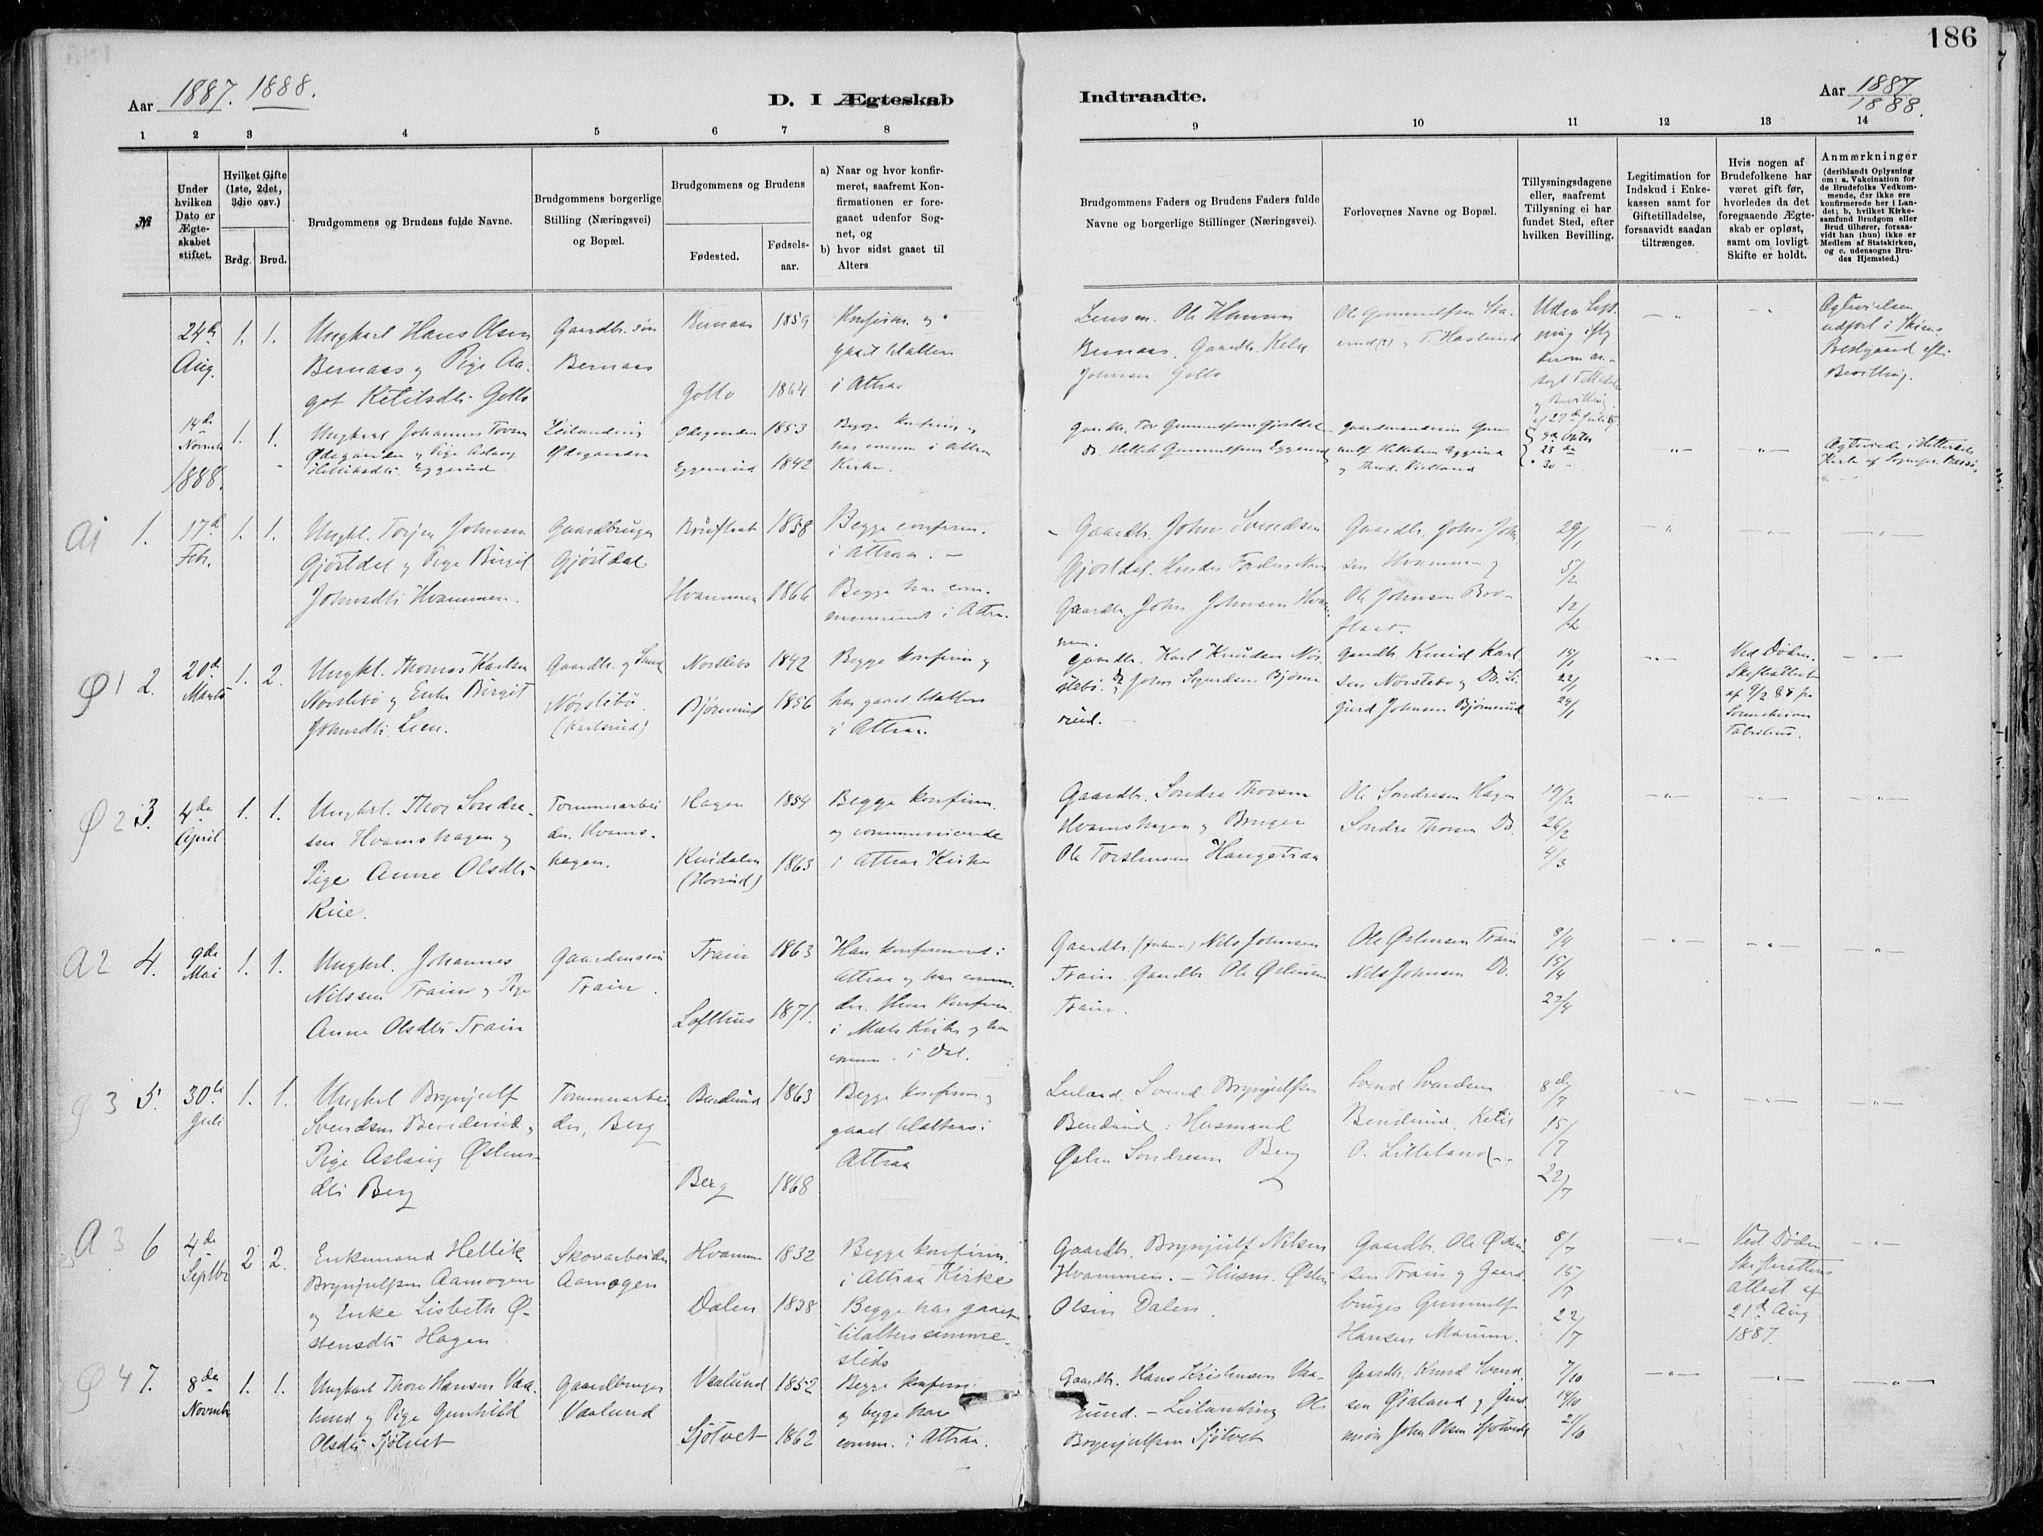 SAKO, Tinn kirkebøker, F/Fa/L0007: Ministerialbok nr. I 7, 1878-1922, s. 186